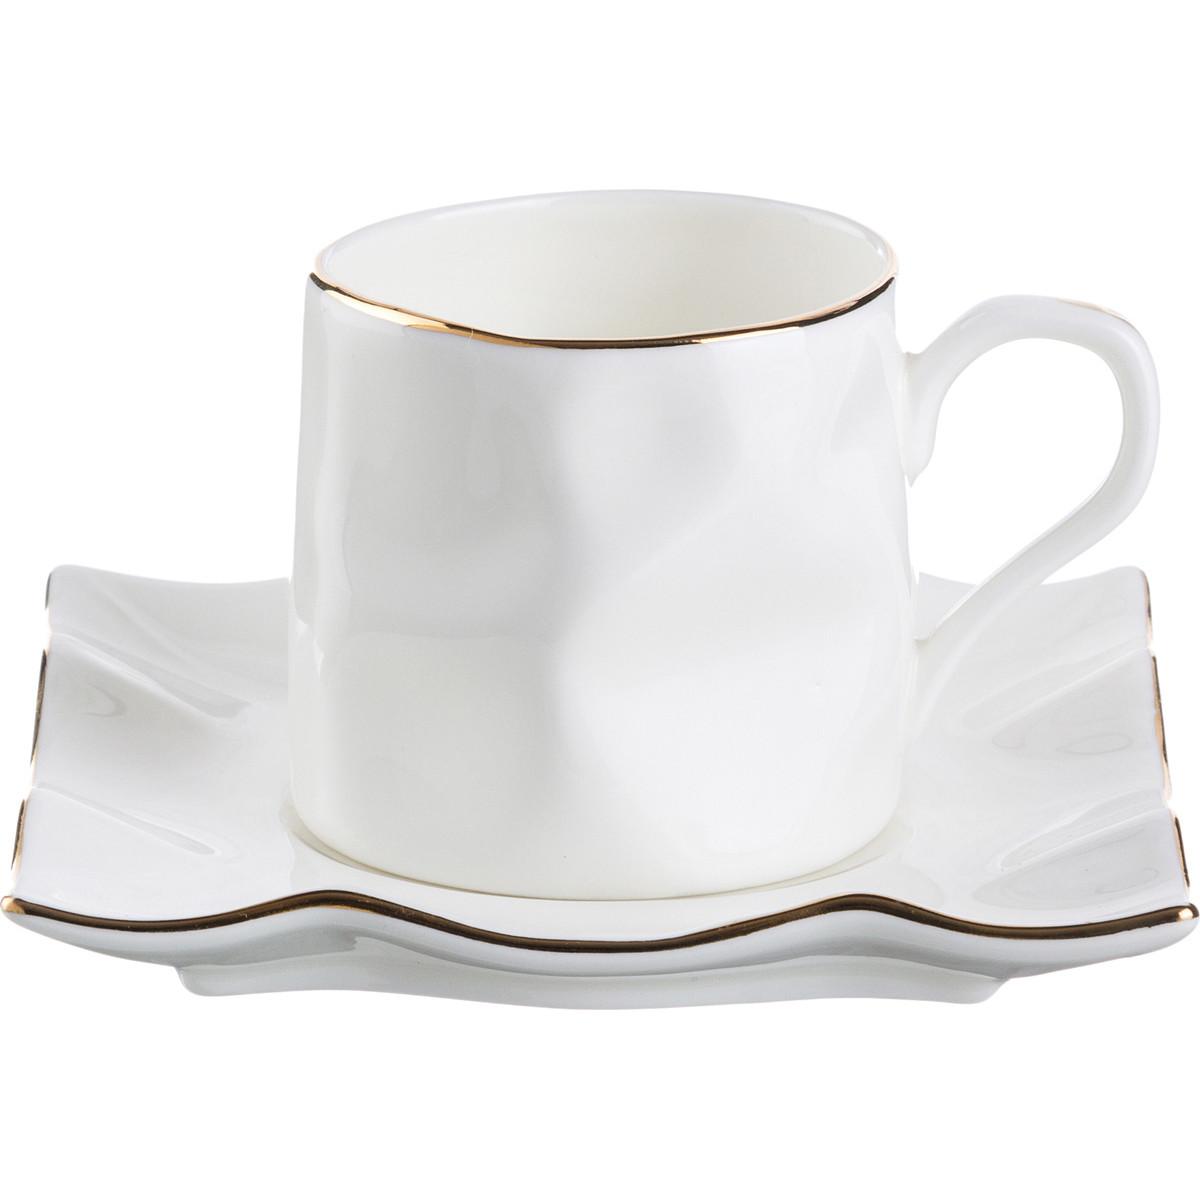 {} Lefard Чайная пара Donough  (150 мл) наборы для чаепития lefard чайная пара венская классика 230мл